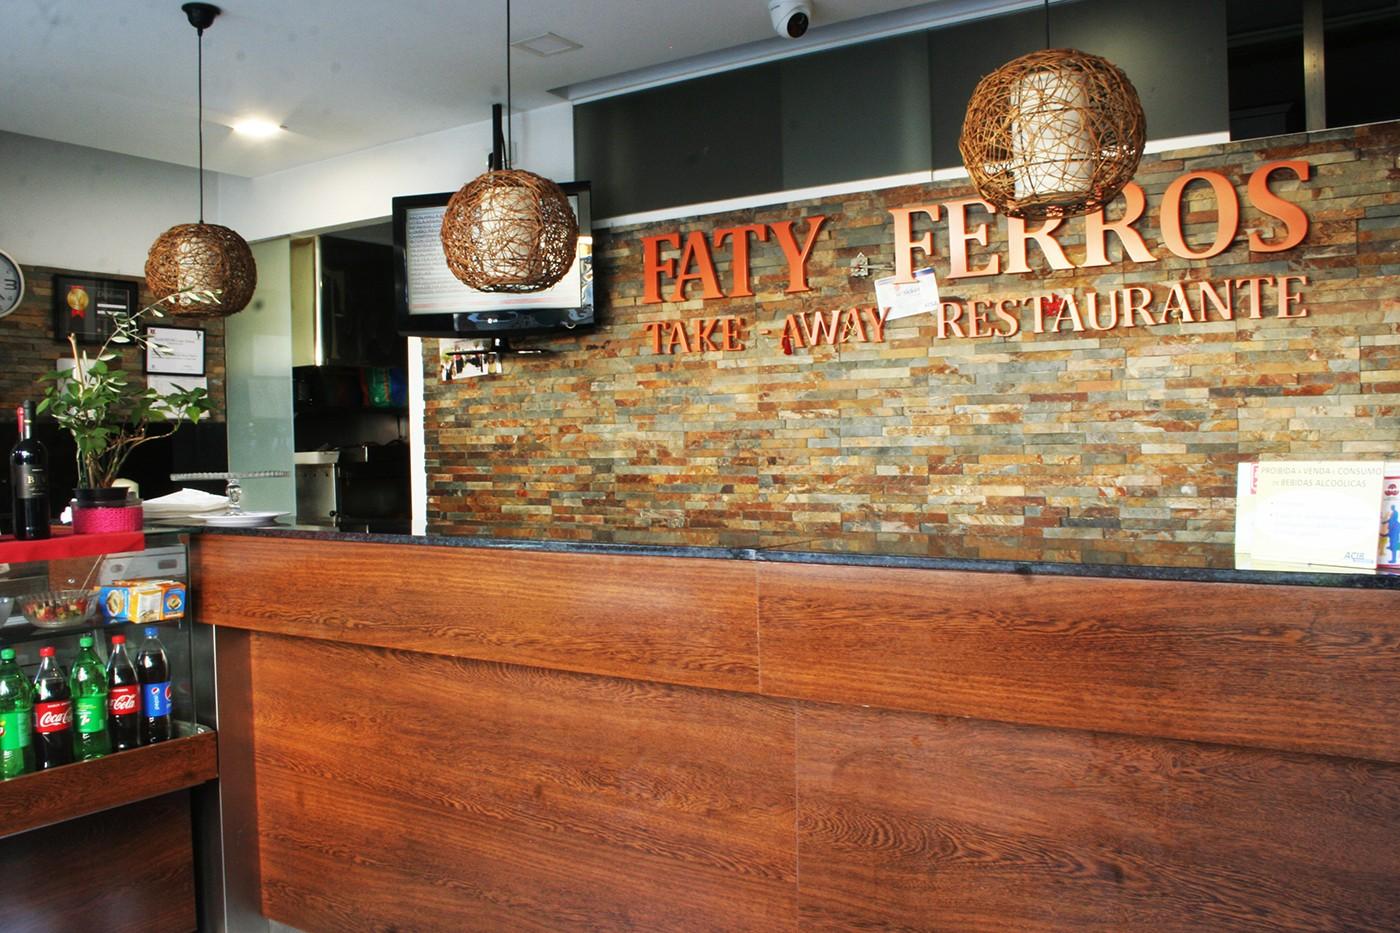 Faty Ferros - Restaurante